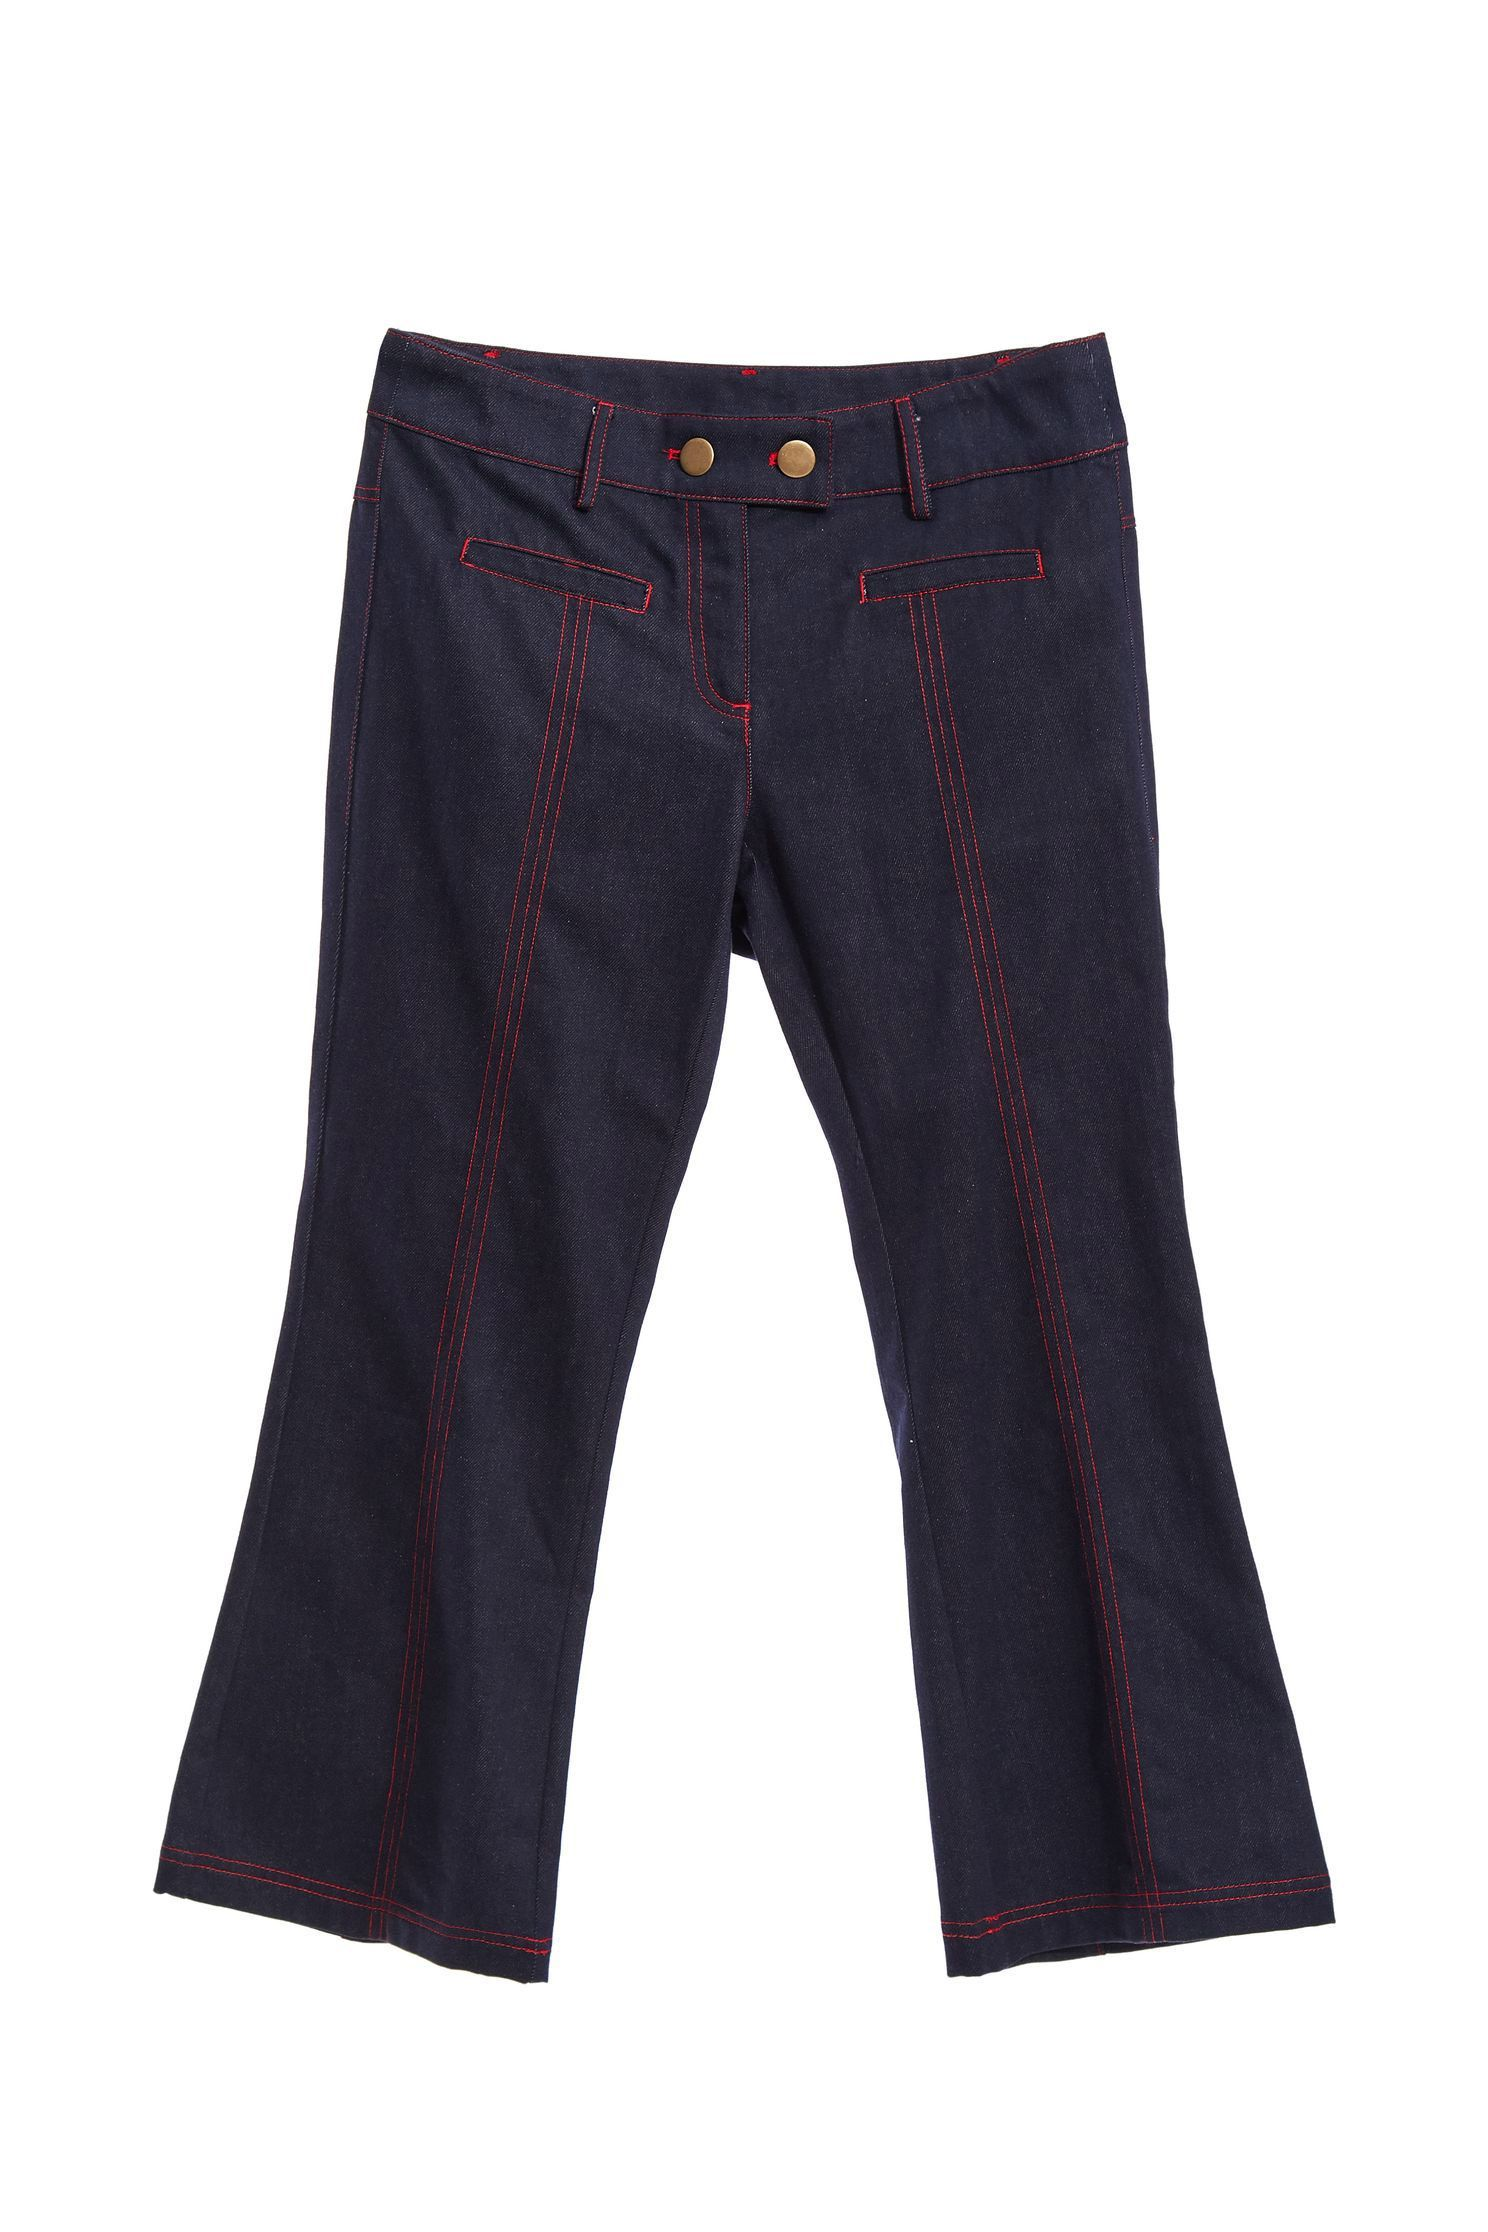 Red threads denim pants